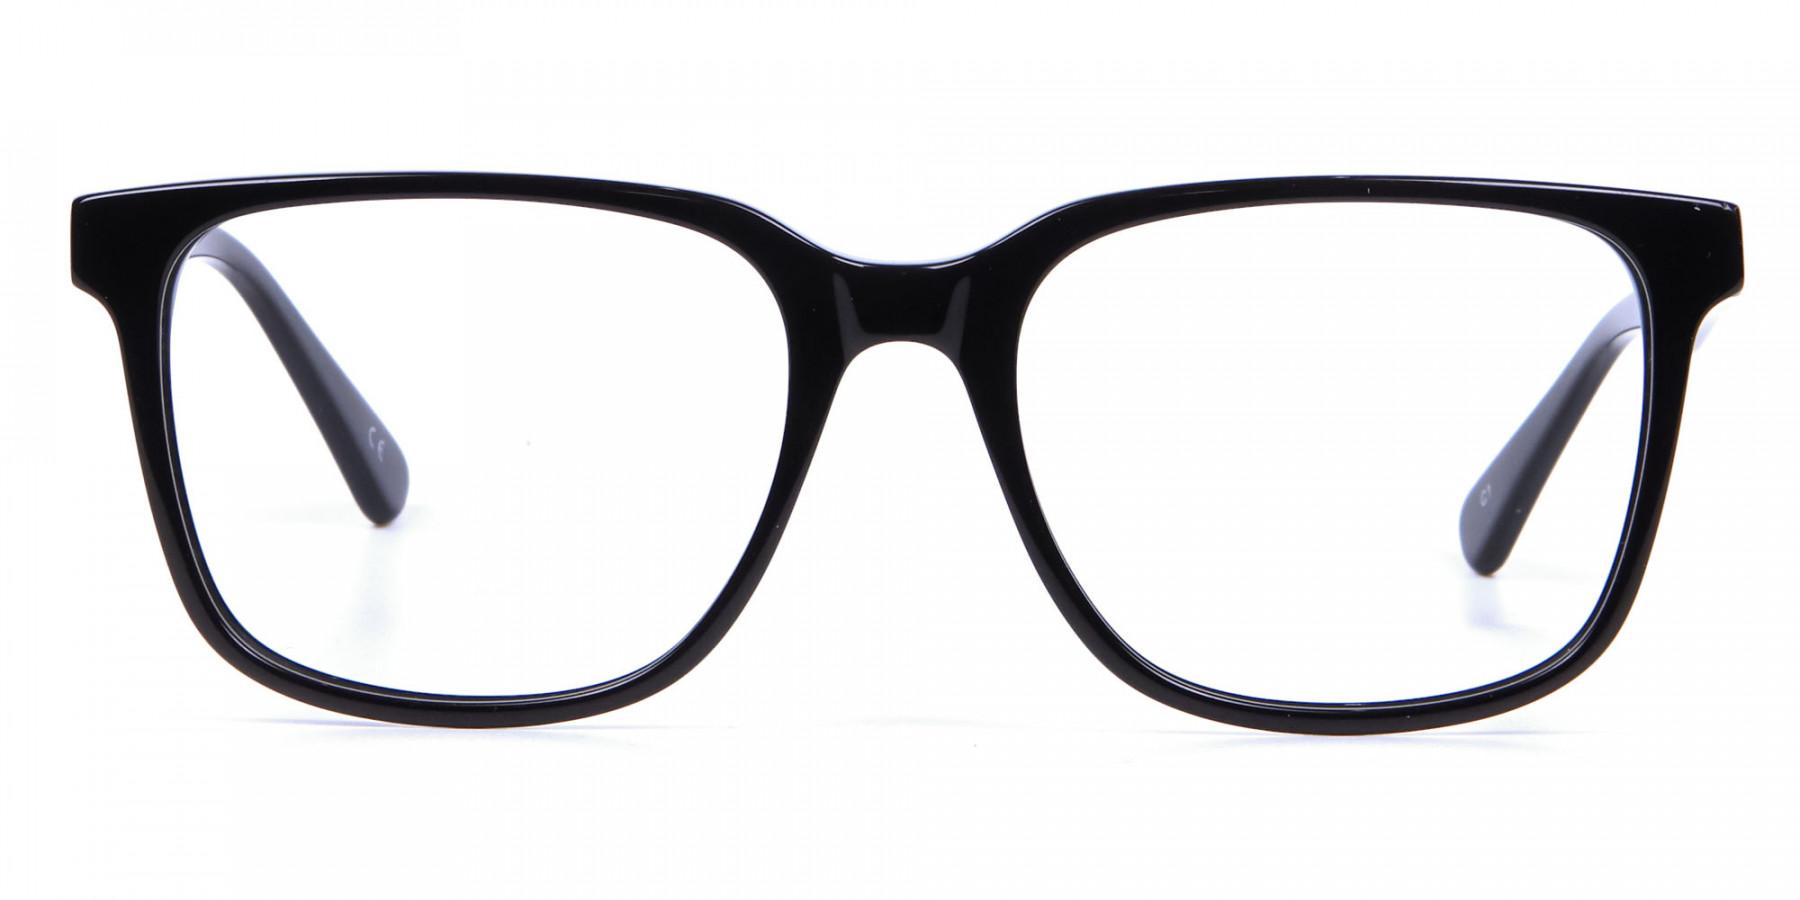 Darkest Black Glasses